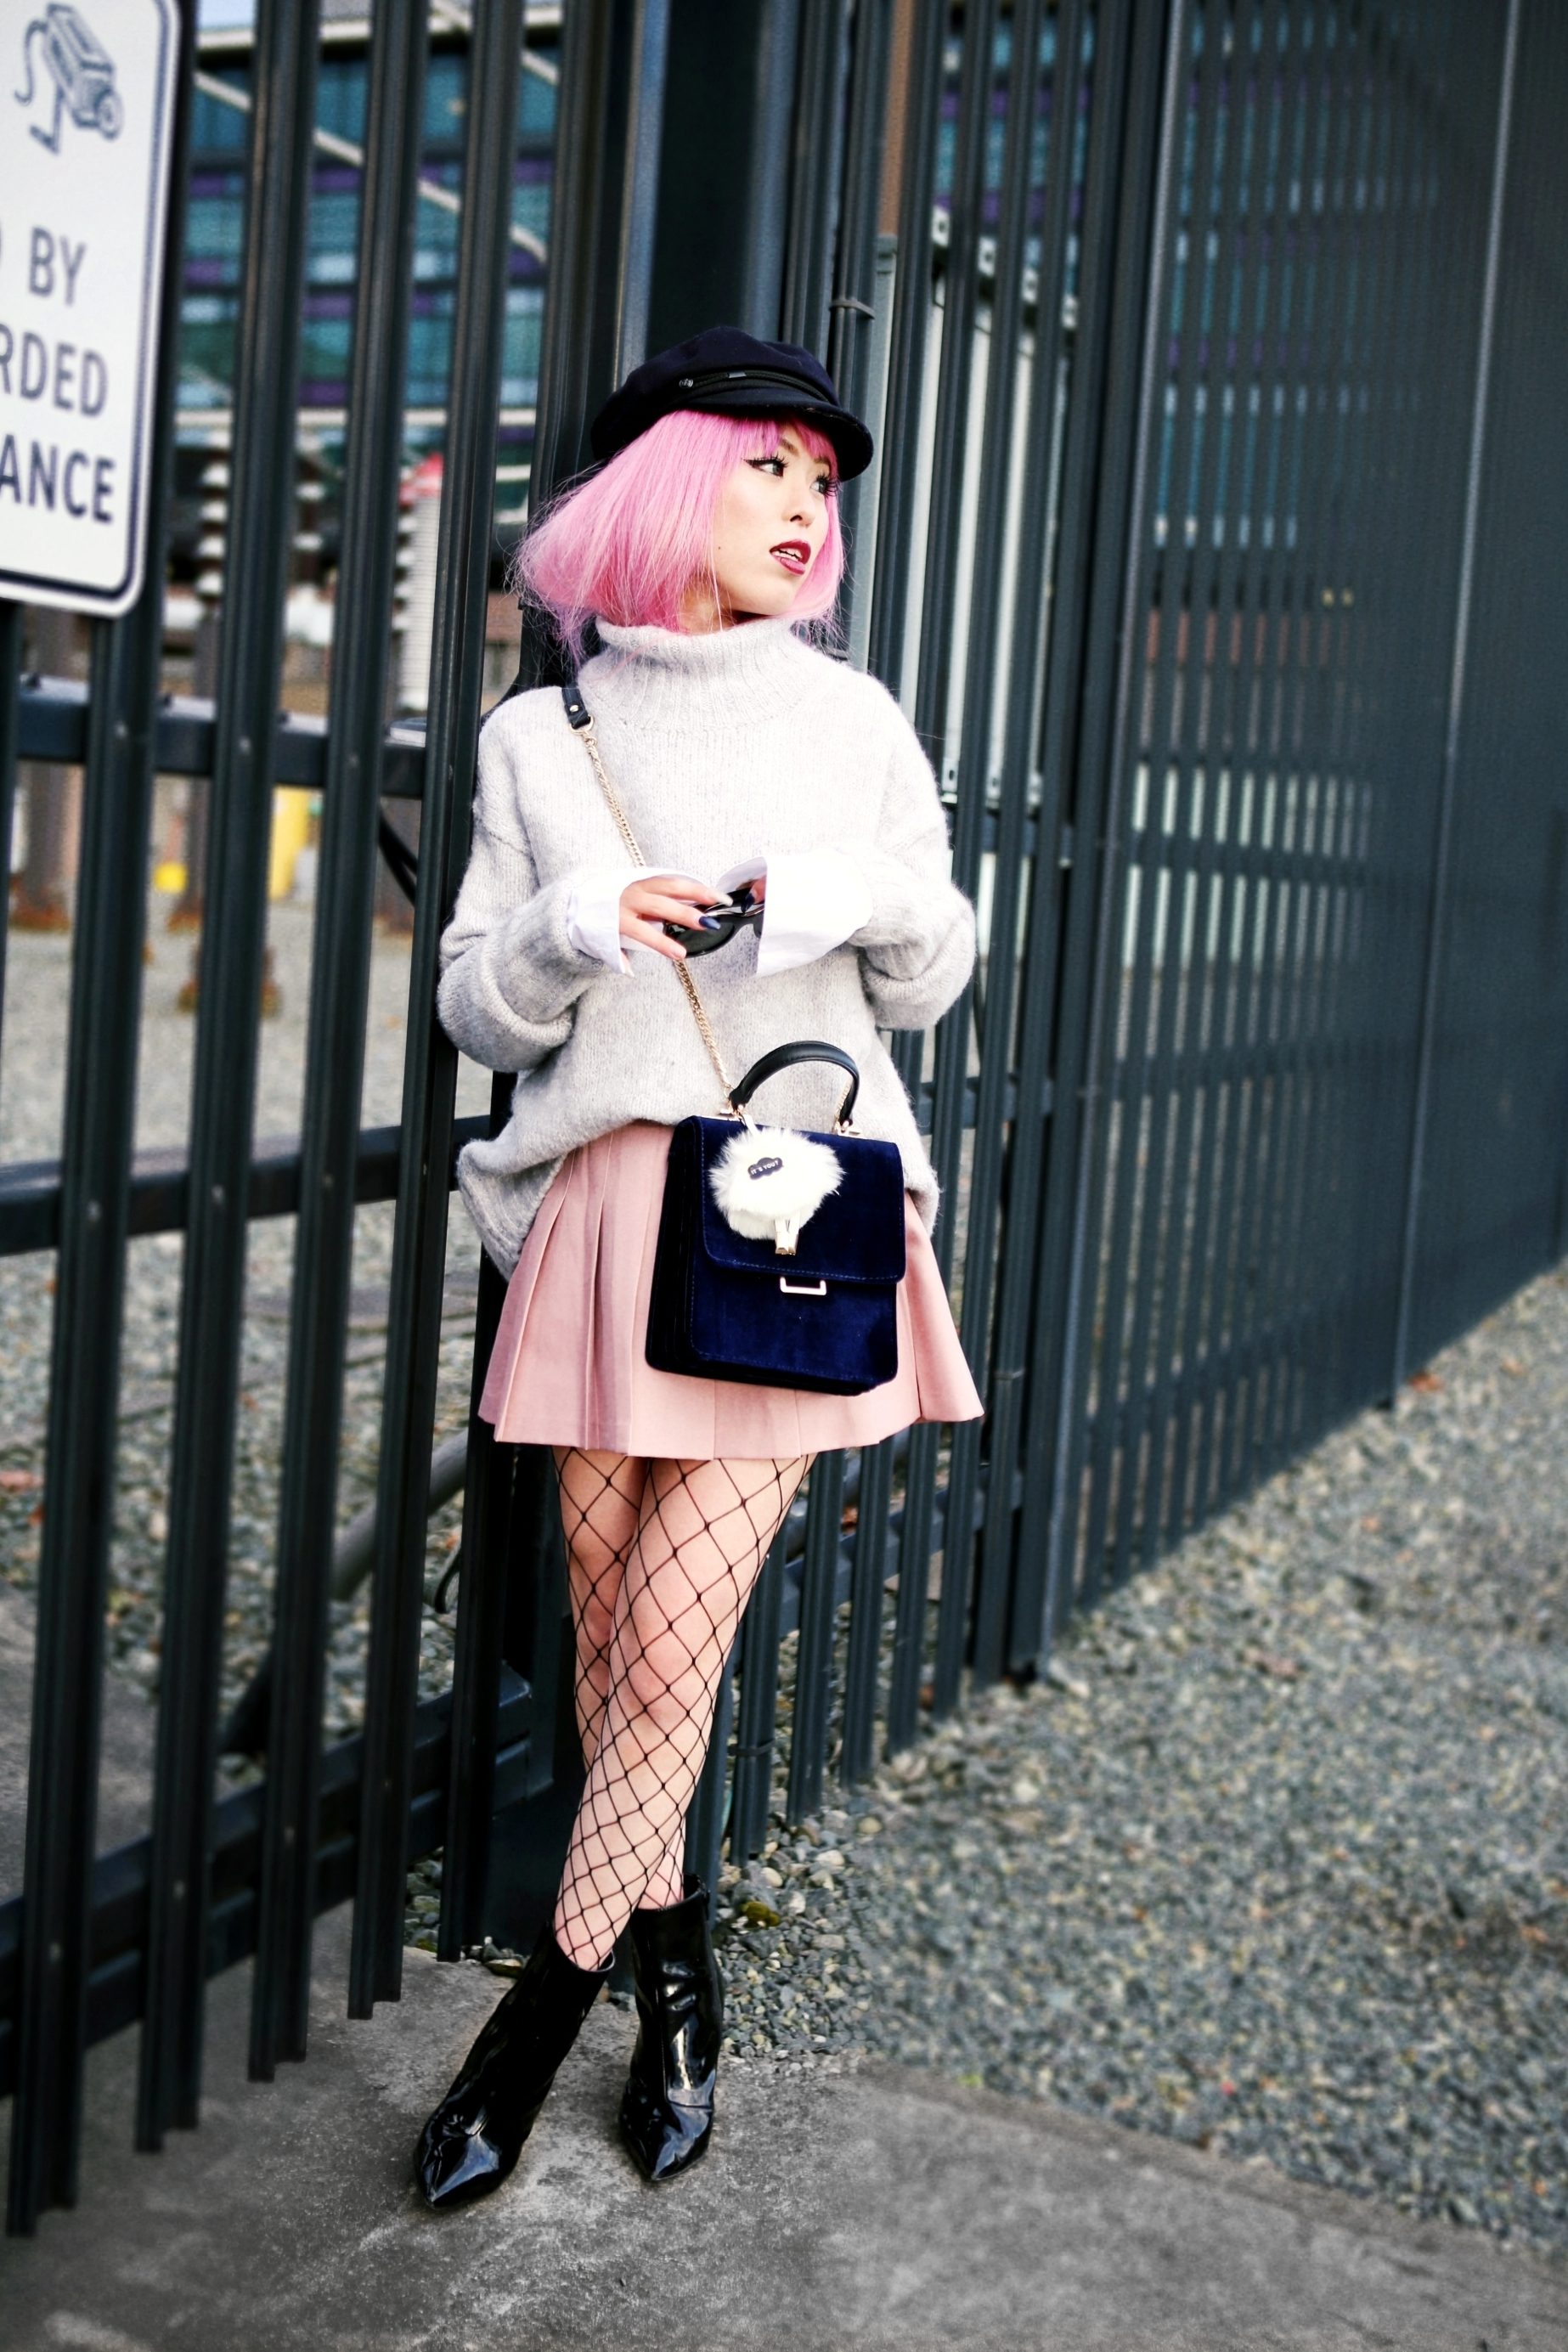 Isabel Marant News Boy Hat-H&M Gray Turtleneck Sweater-H&M Wide cuff Cotton Shirt-Forever 21 Pleated Mini Skirt-Boohoo Wide Fishnet Tights-ZARA Velvet Bag-ALDO Patent Booties-Le Specs Air Heart Sunglasses-Milani Black Cherry Lipstick-Aikas Love Closet-Seattle Style Lifestyle Blogger-japanese-pink hair 20